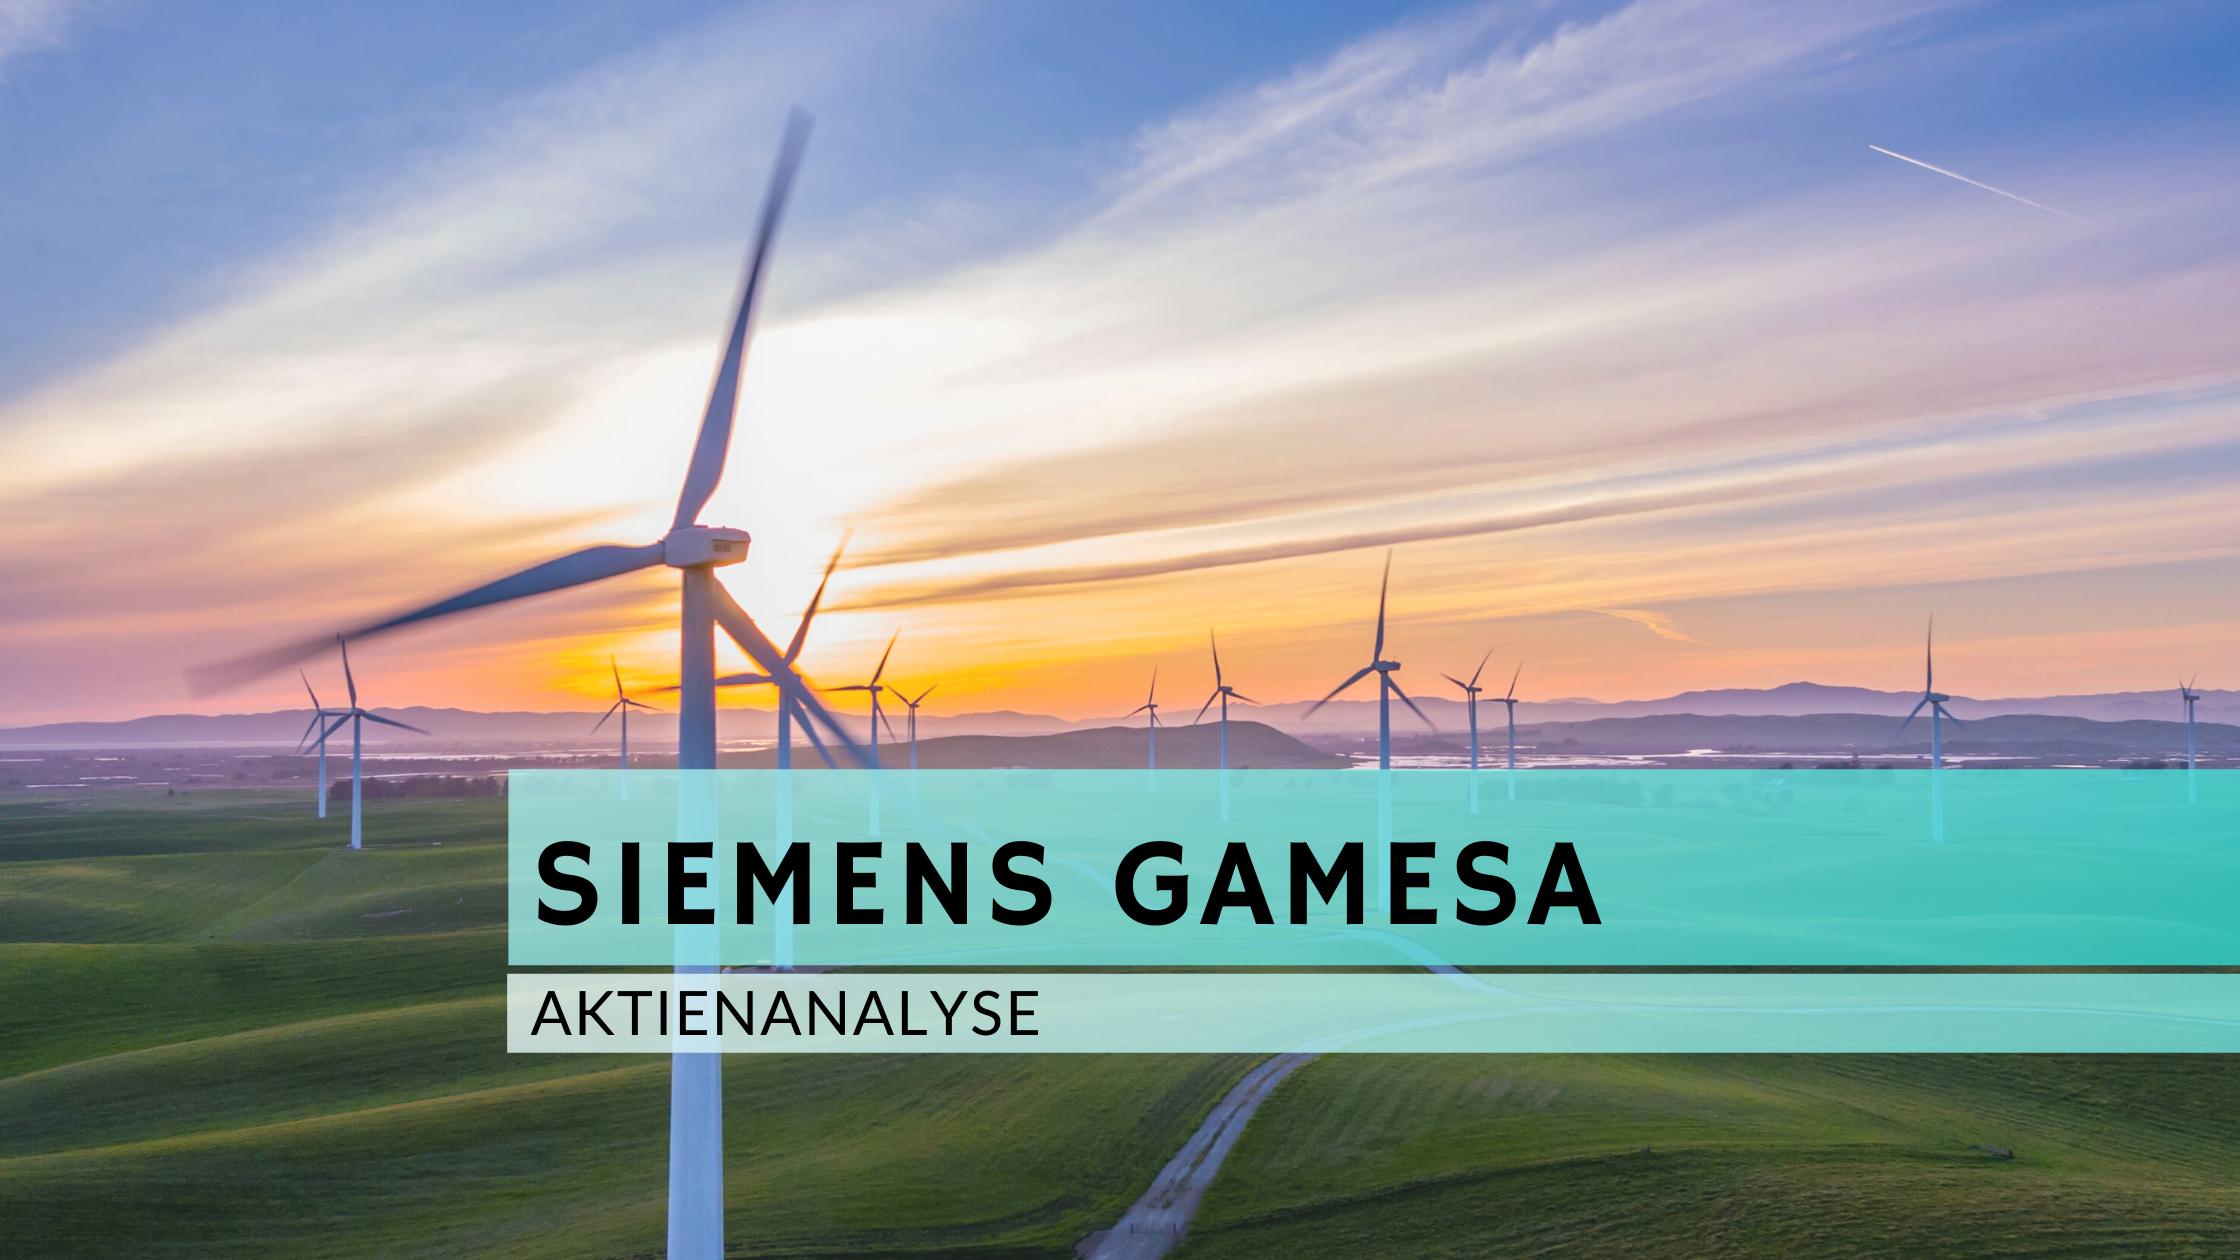 Siemens Gamesa Aktienanalyse